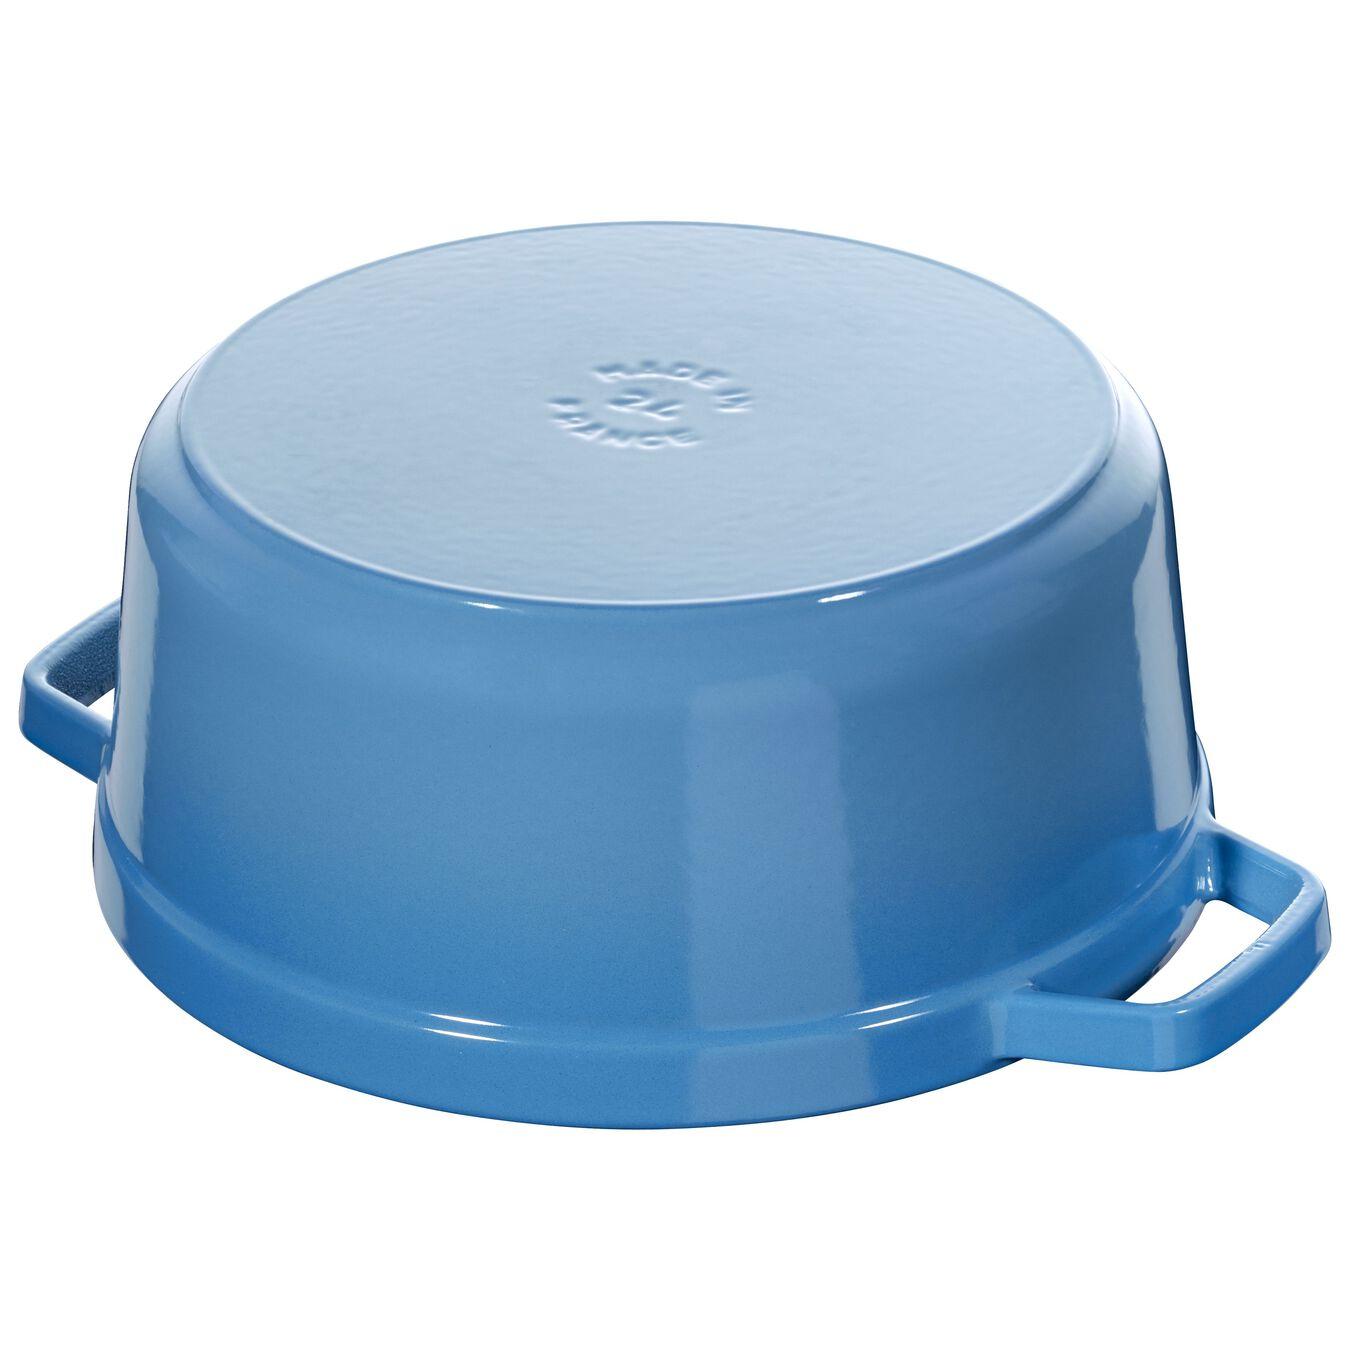 3.8 l Cast iron round Cocotte, ice-blue,,large 3